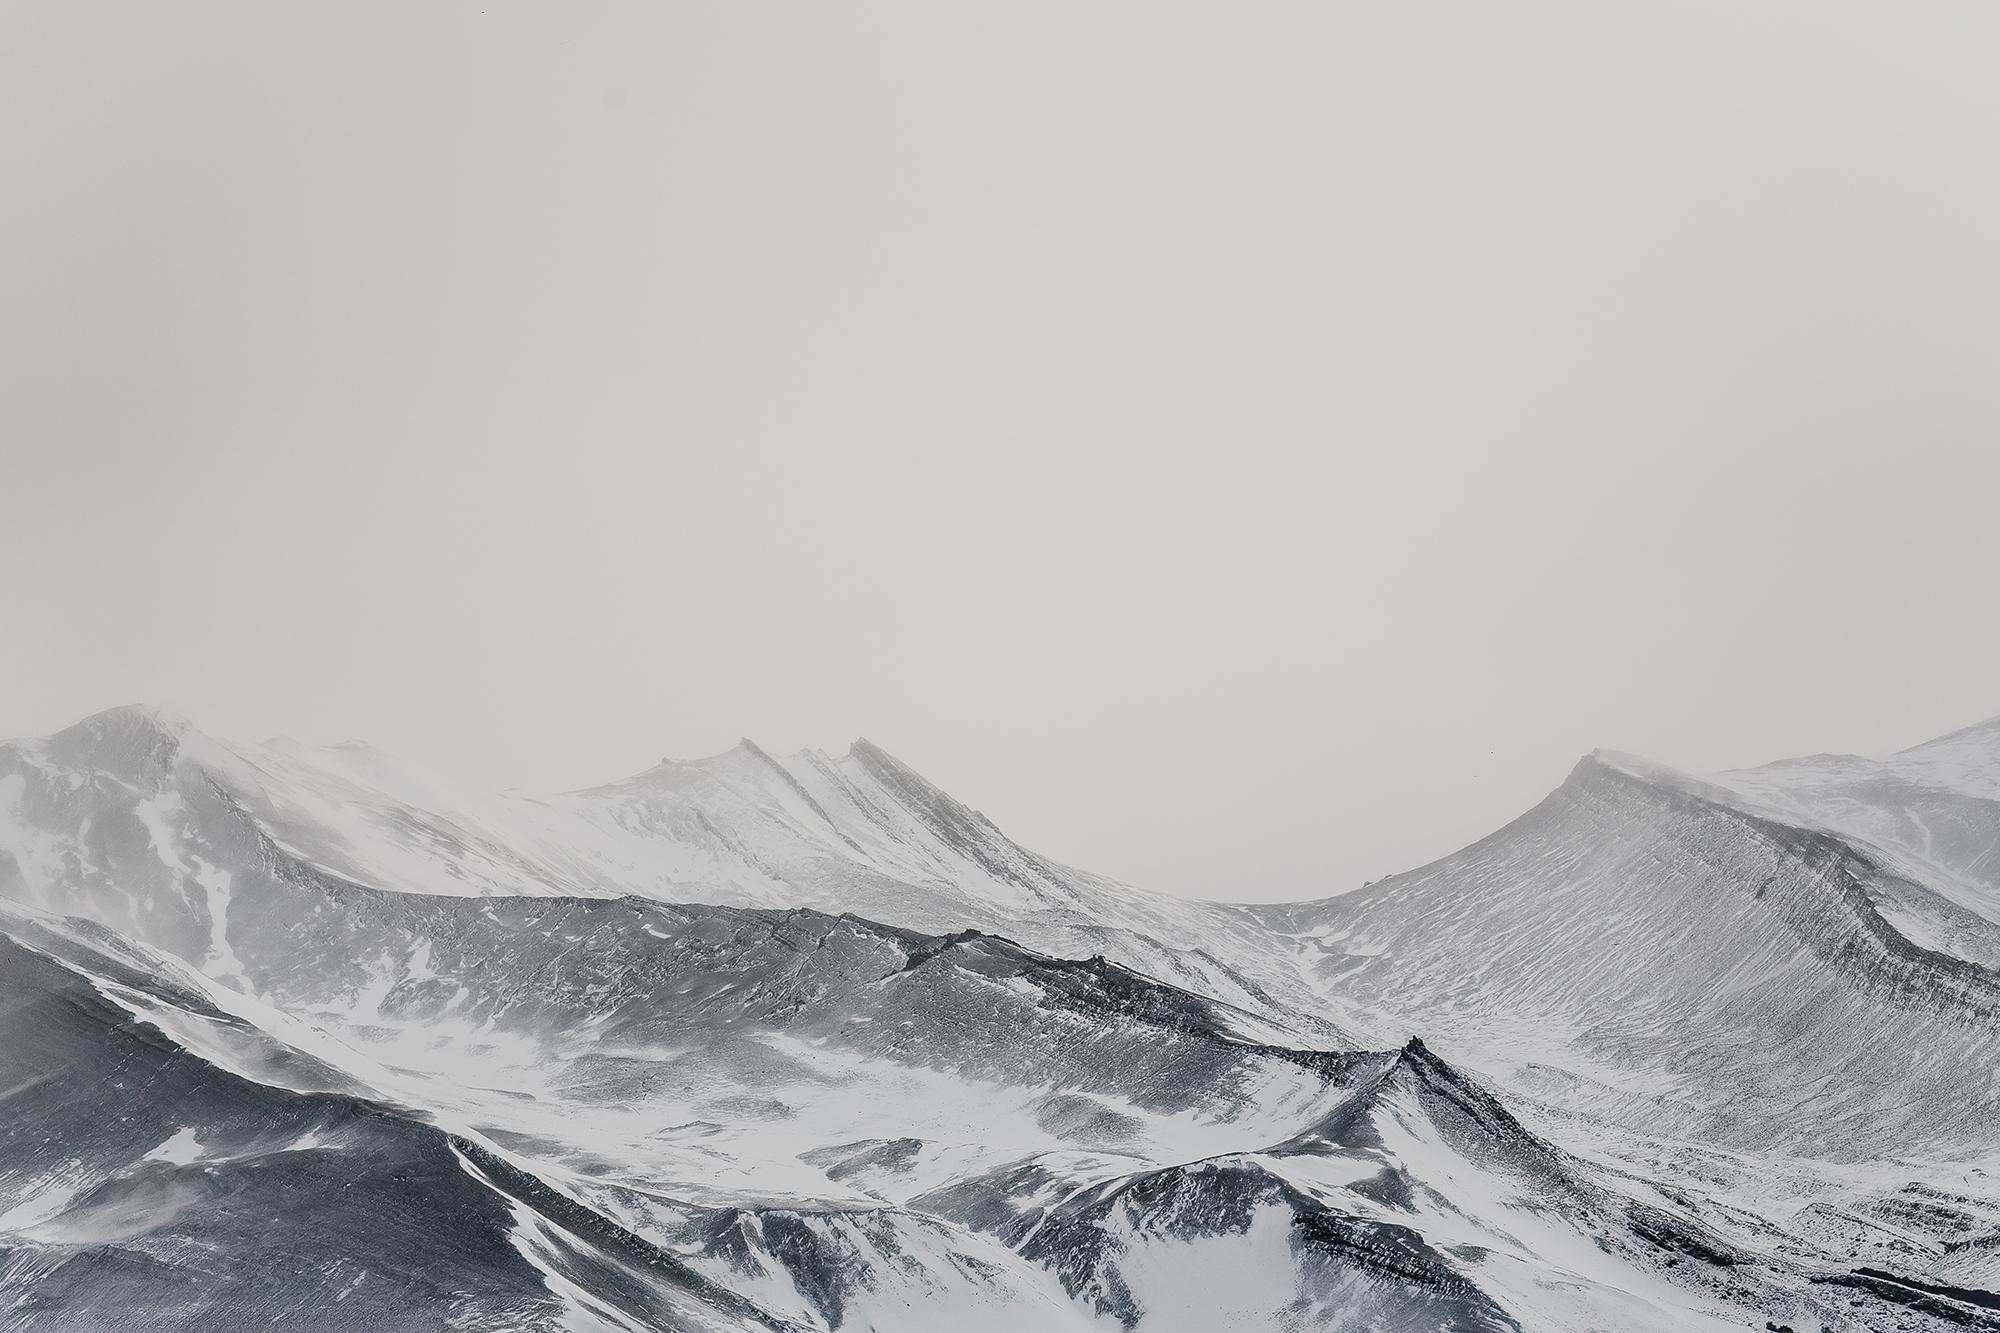 2I7B1544-patagonie-chili-sophie-narses-photographe-paysage-monde-annecy-tirages